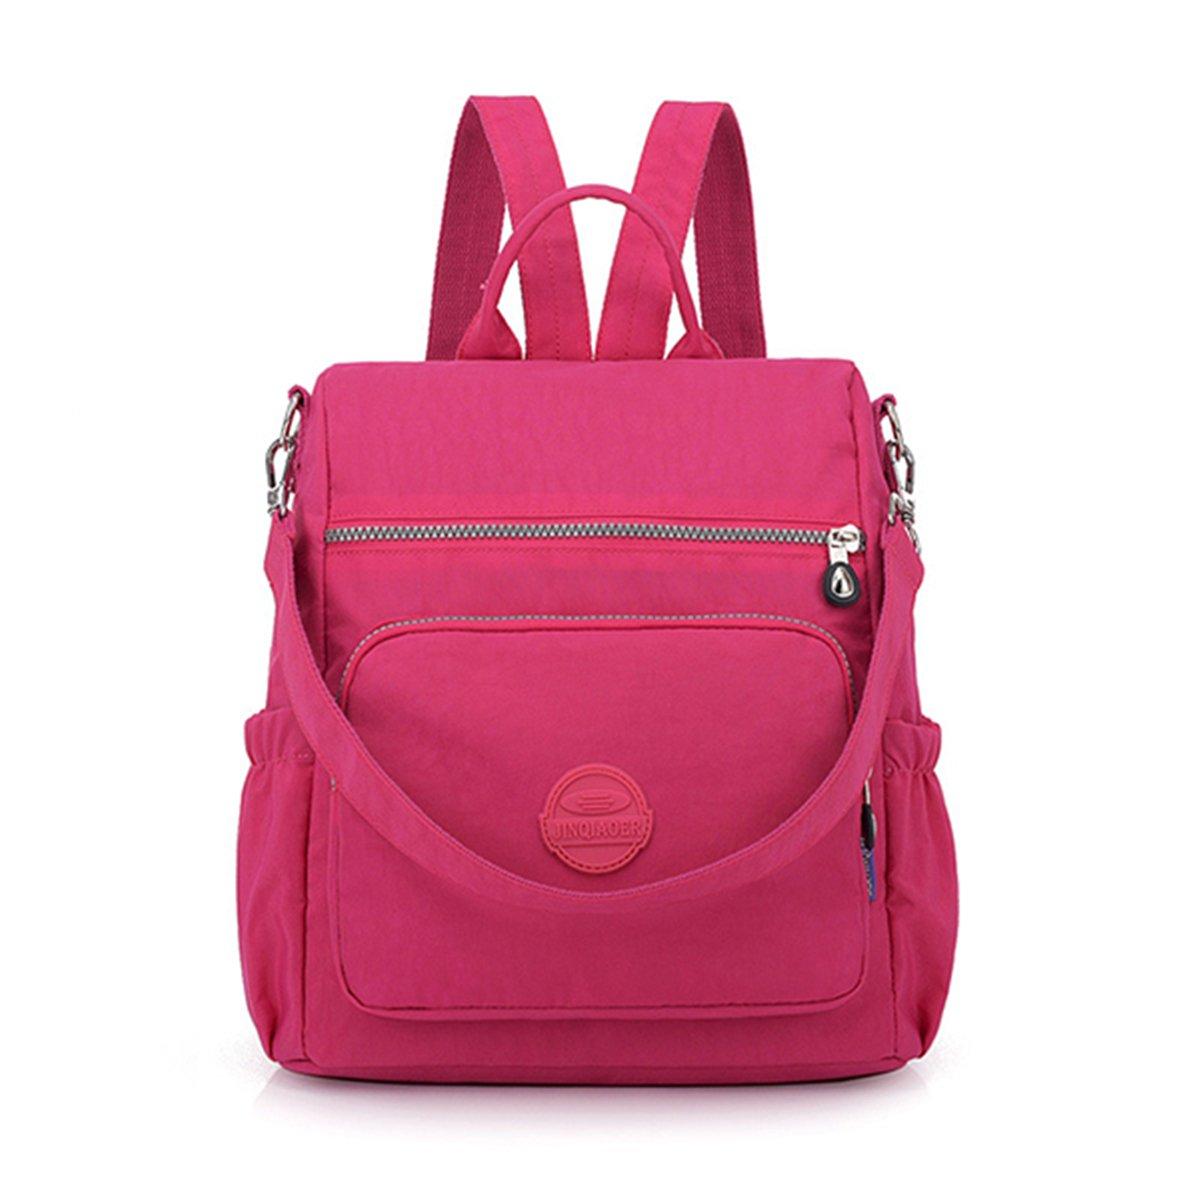 Women Nylon Backpack, JOSEKO Multi-Function Rucksack Anti-Theft Waterproof Shoulder Bag Black